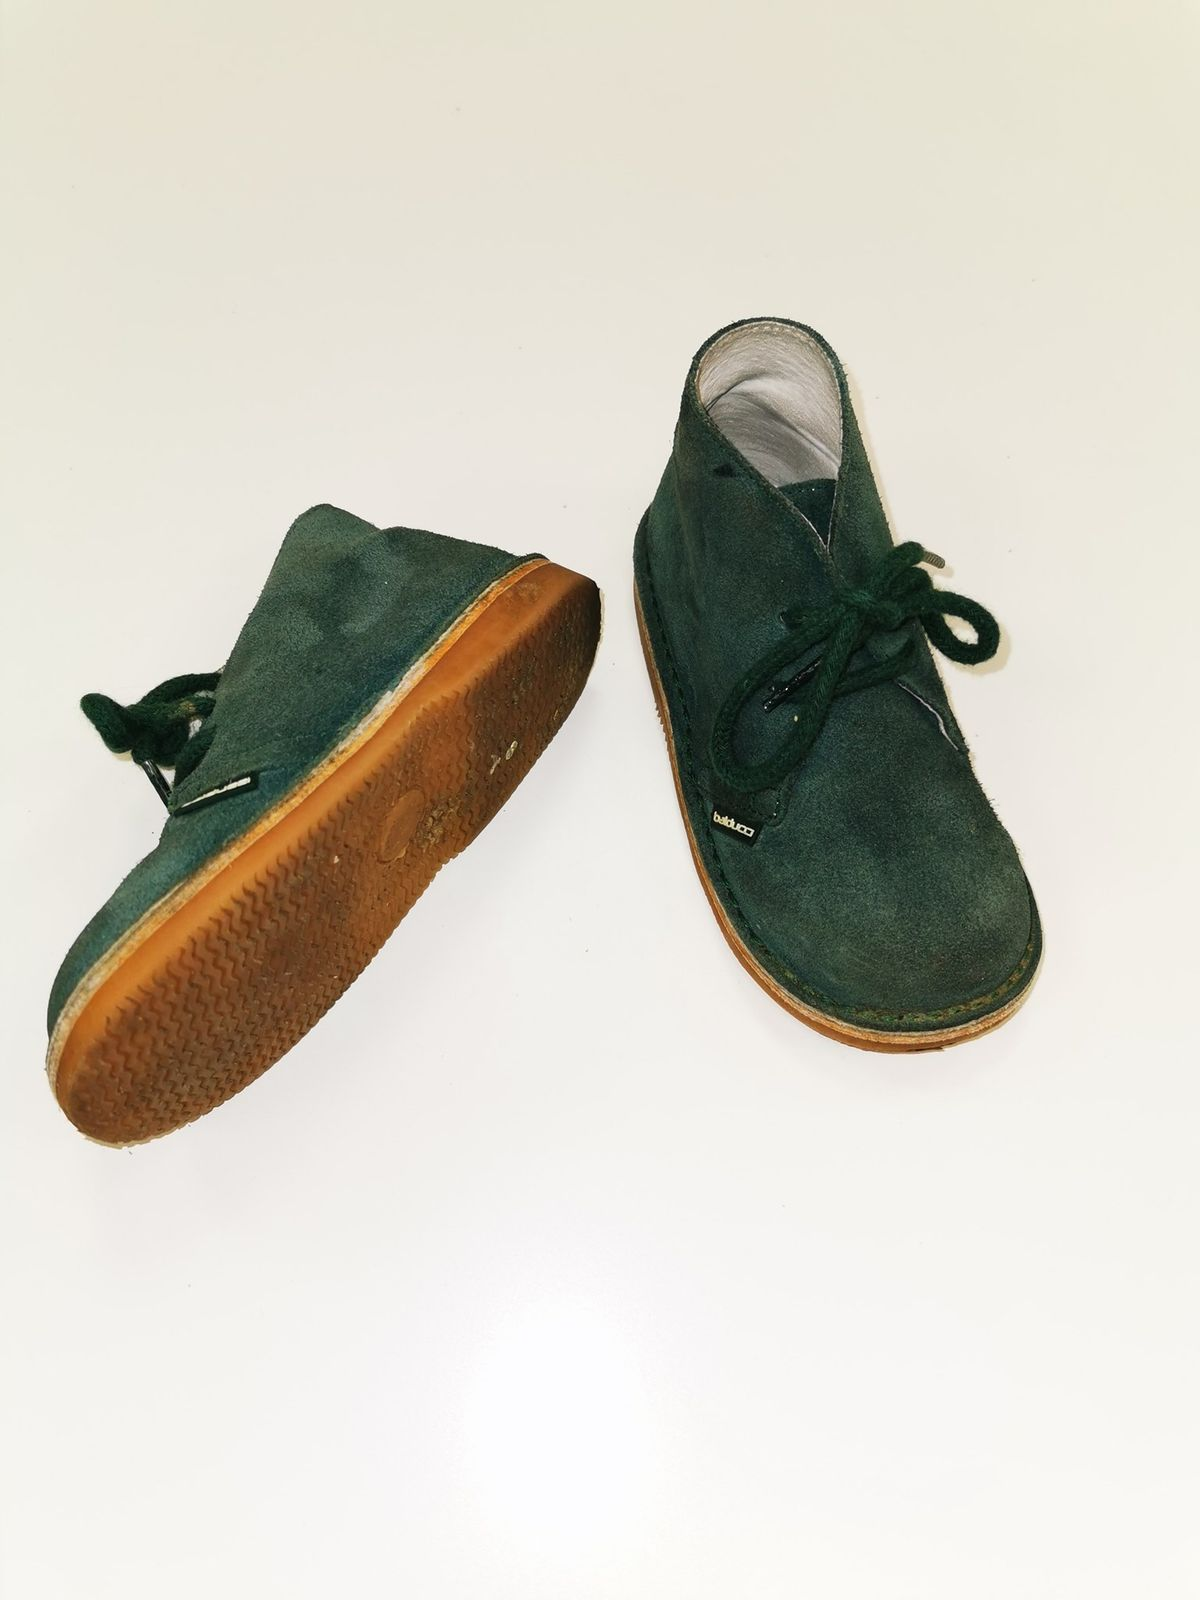 Balducci scamosciato verde Bimbo N 24  9294 Euro 21,00